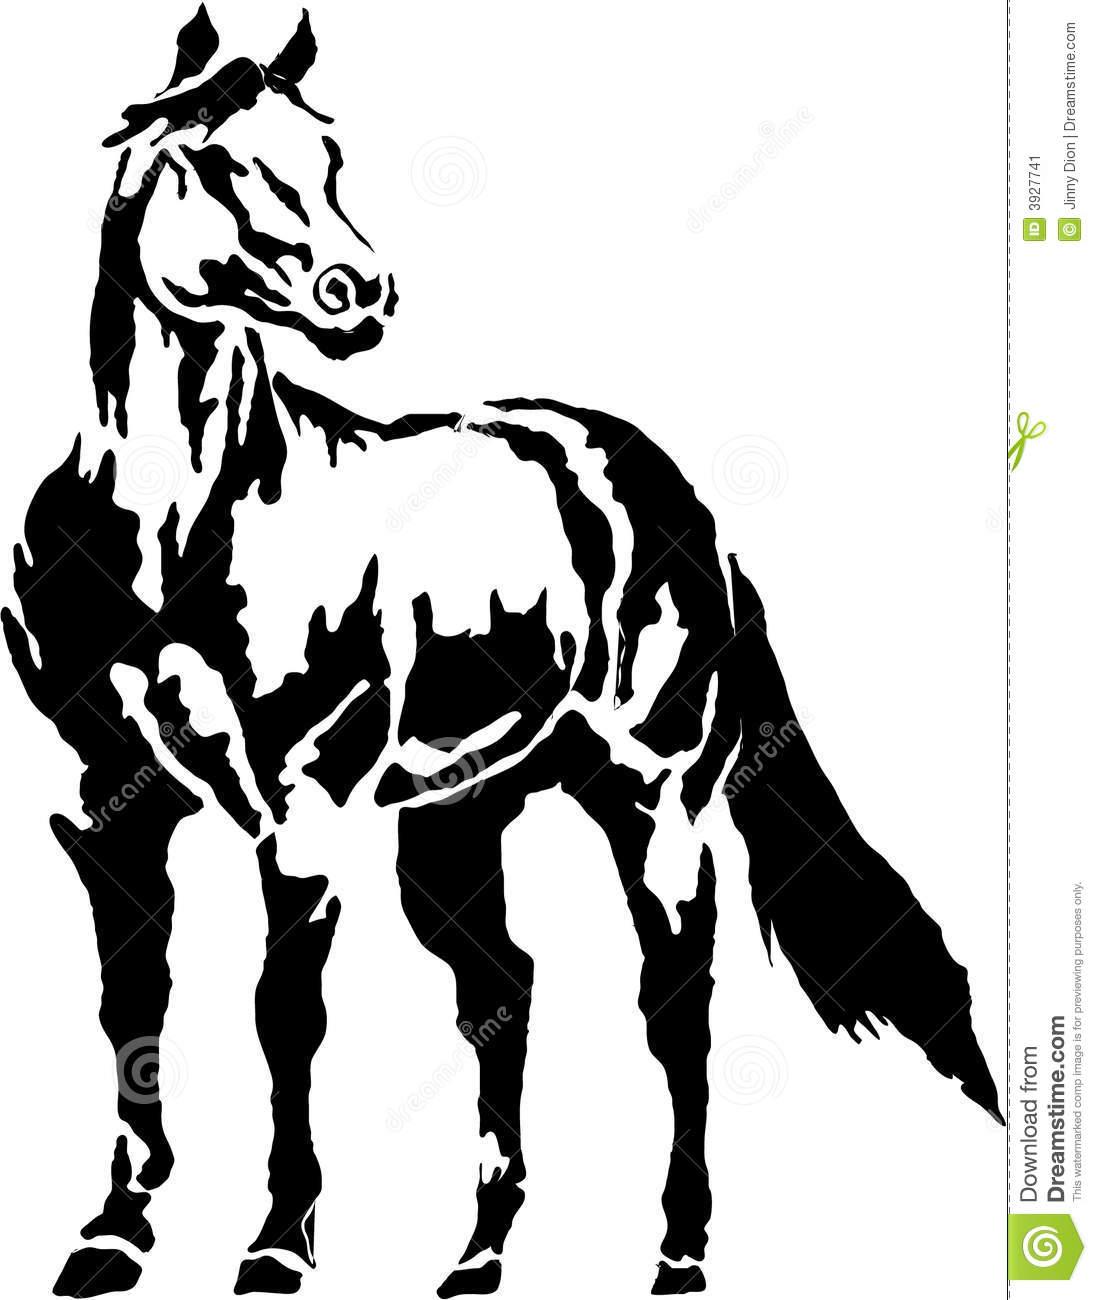 Head clipart quarter horse Horse Outline Quarter Horse Outline